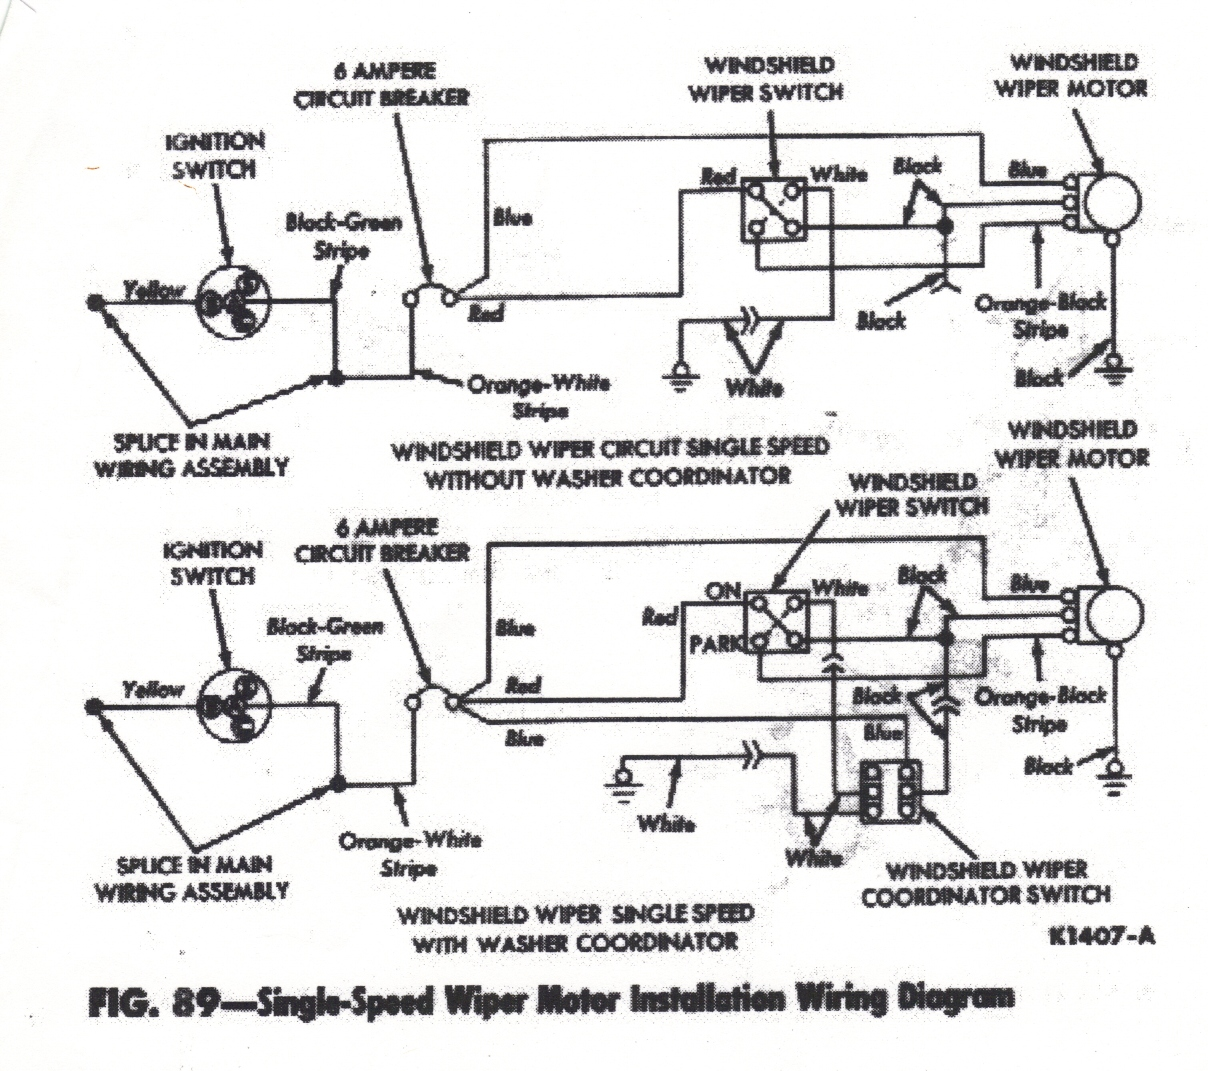 ba falcon ignition switch wiring diagram 2005 honda civic wiper 1964 comet 02 dakota engine